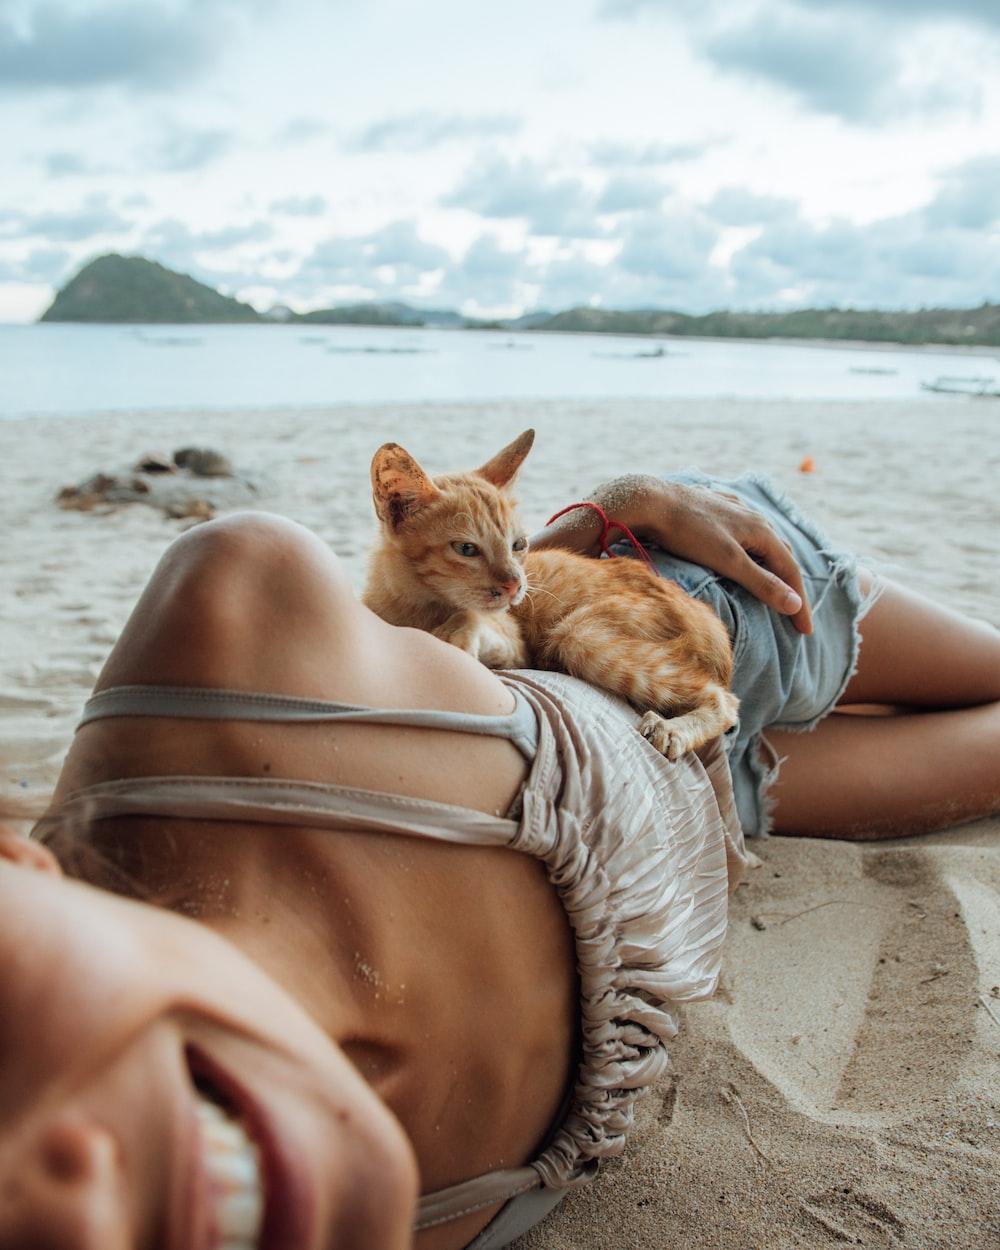 orange tabby cat on woman body